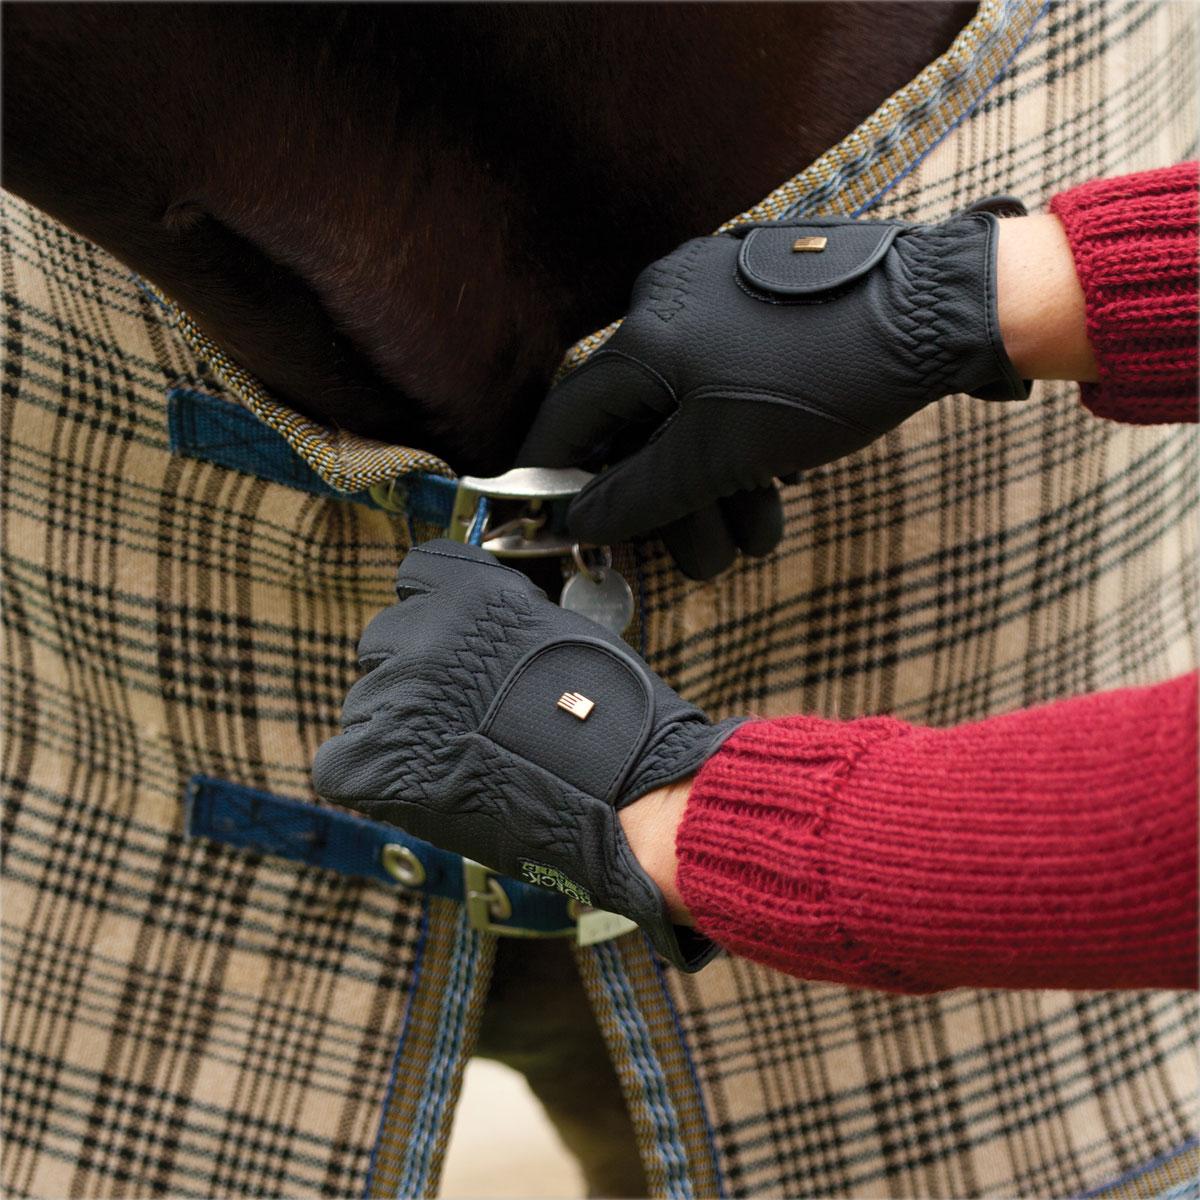 Gloves Navy 6.5 Roeckl Roeck-Grip Winter Winter Chester